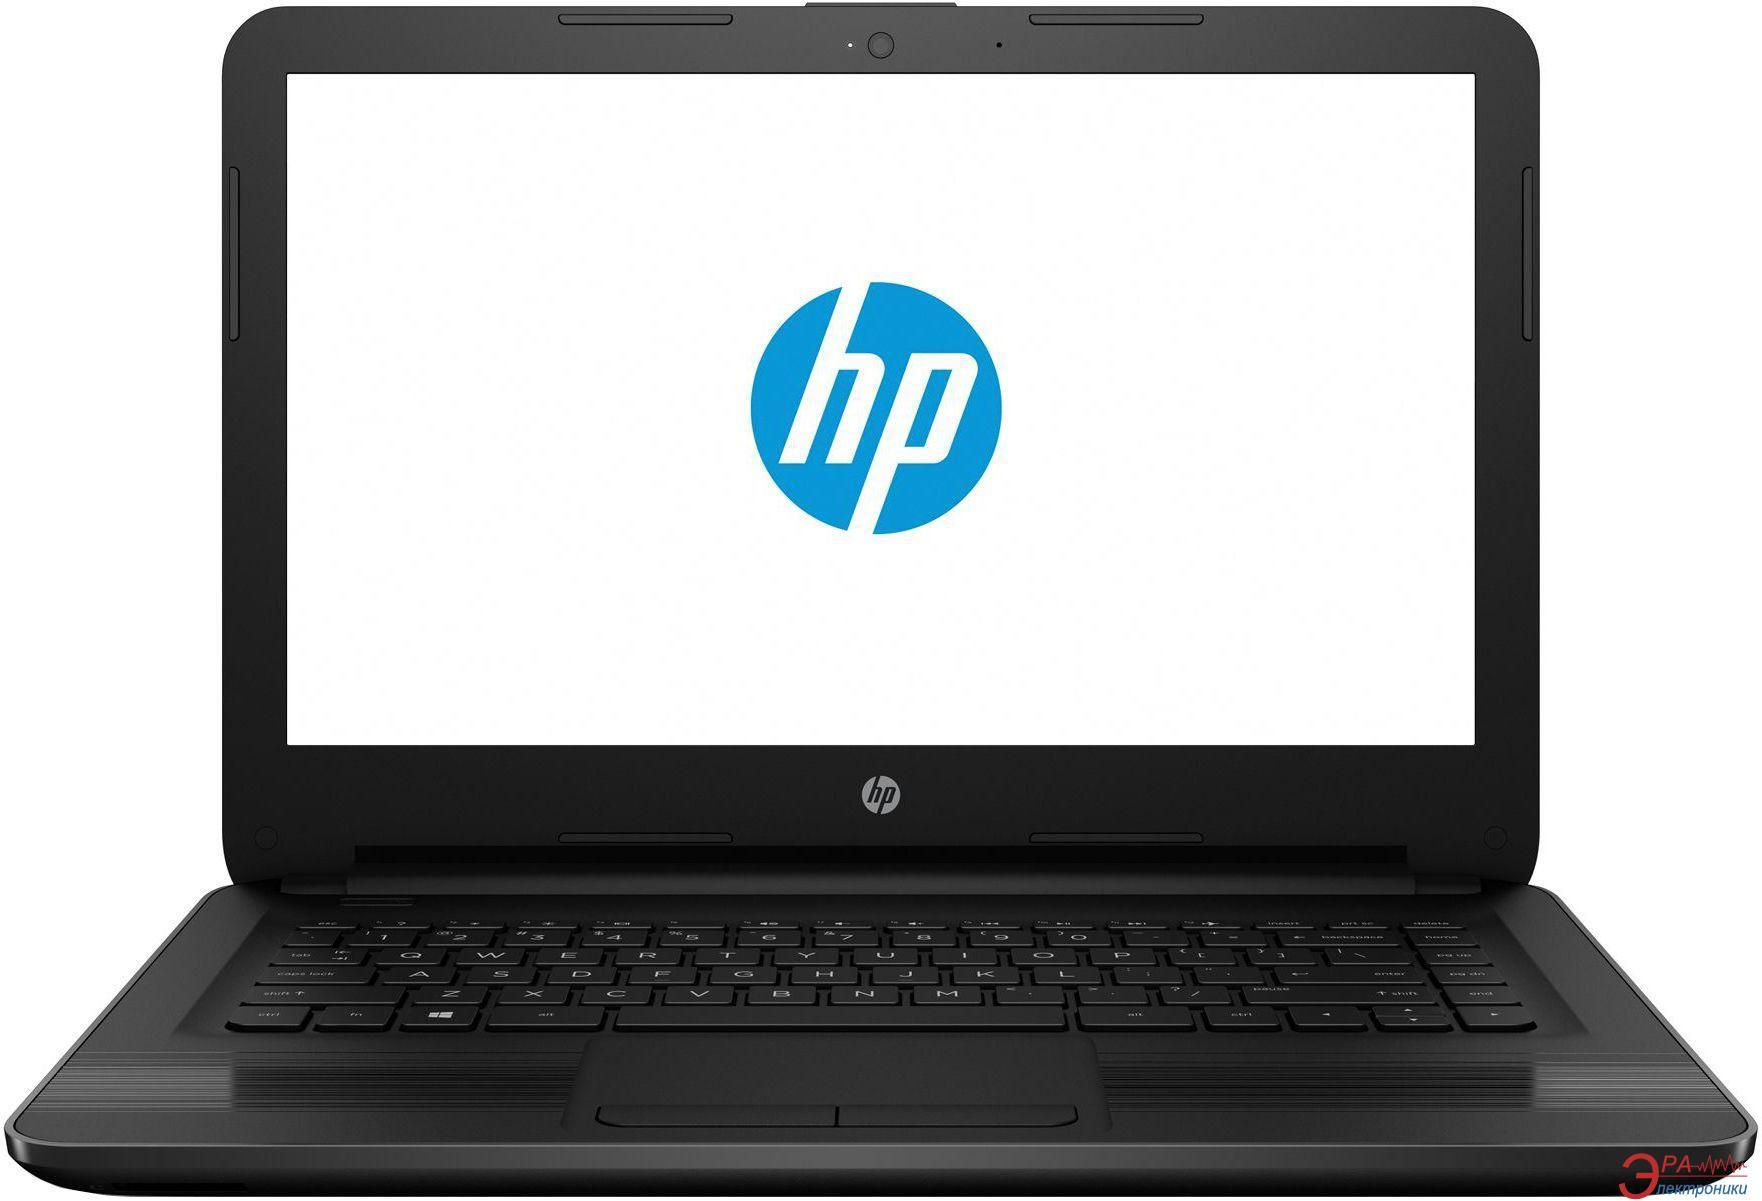 Ноутбук HP 14-am005ur (W7S18EA) Black 14